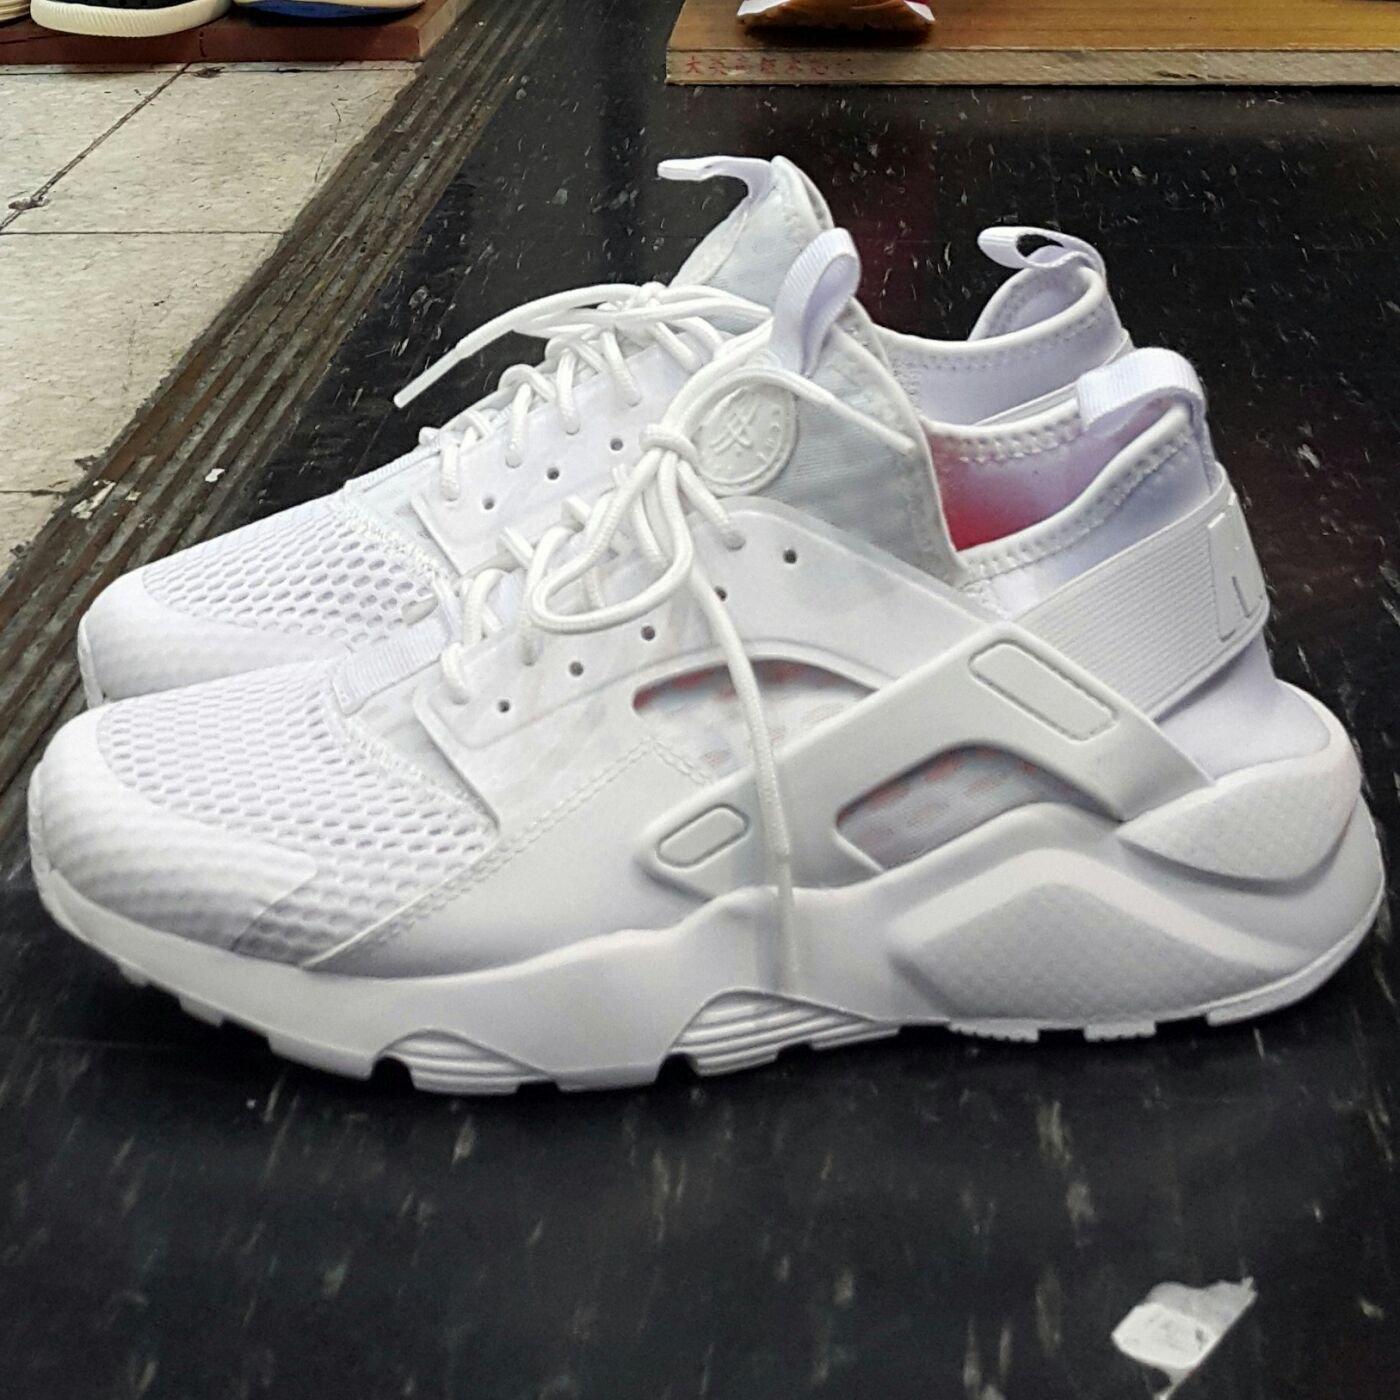 NIKE AIR HUARACHE RUN ULTRA BR 白色 全白 白武士 武士鞋 2代 833147-100